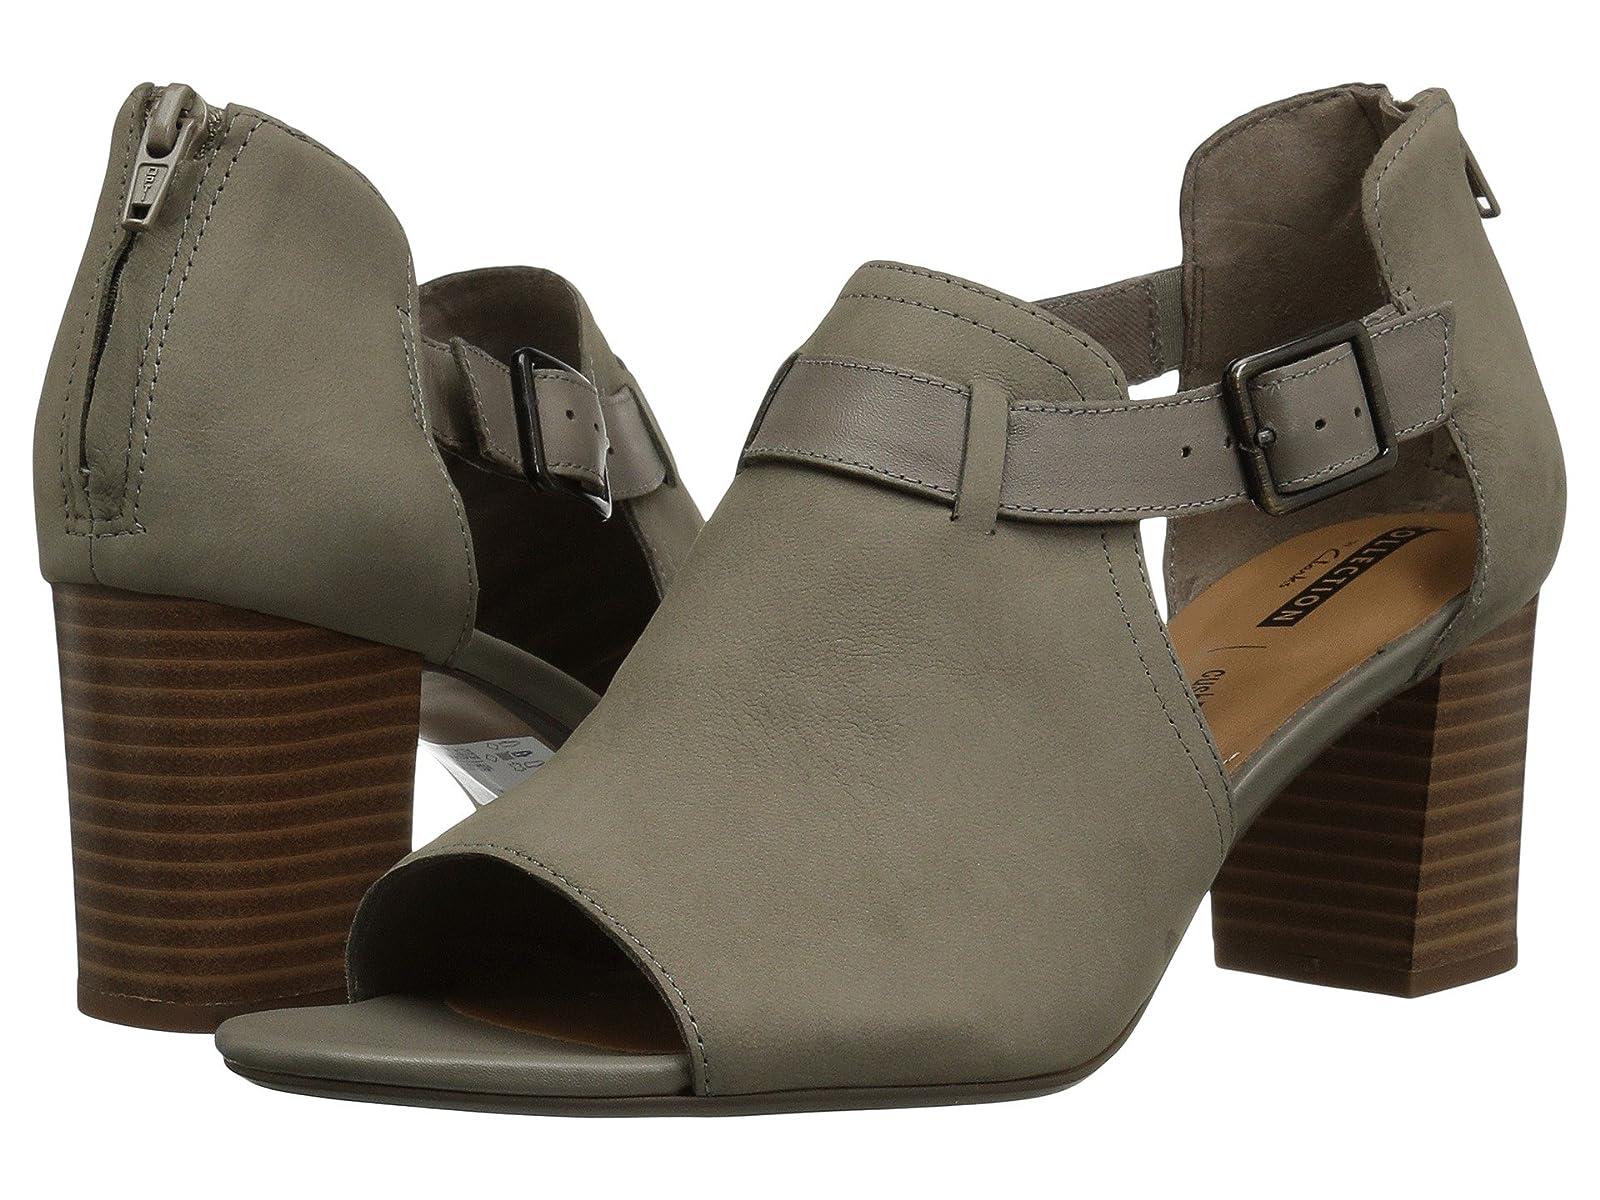 Clarks Deva ValeriaCheap and distinctive eye-catching shoes